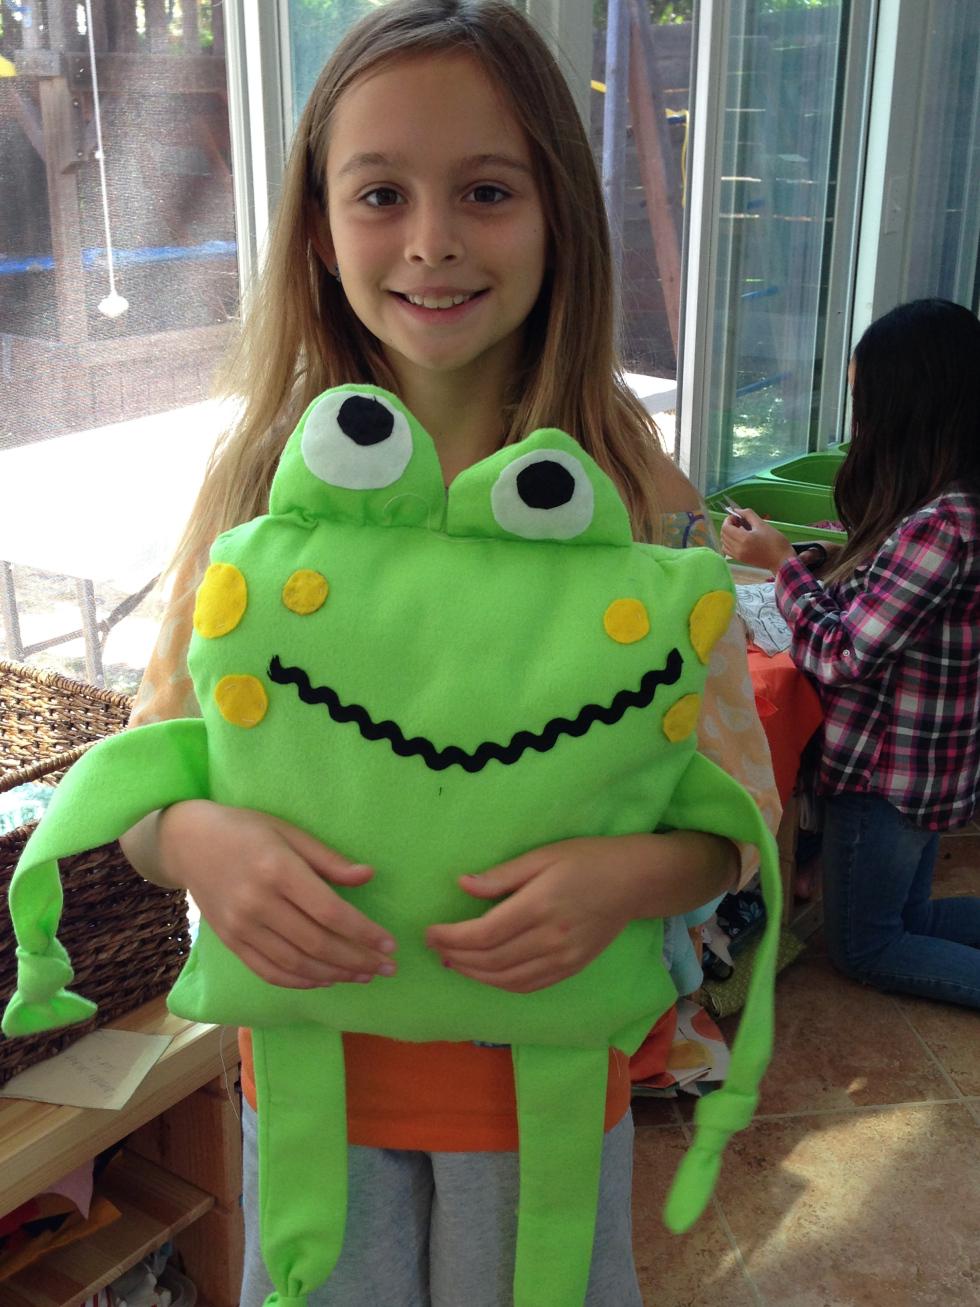 4th grader froggy